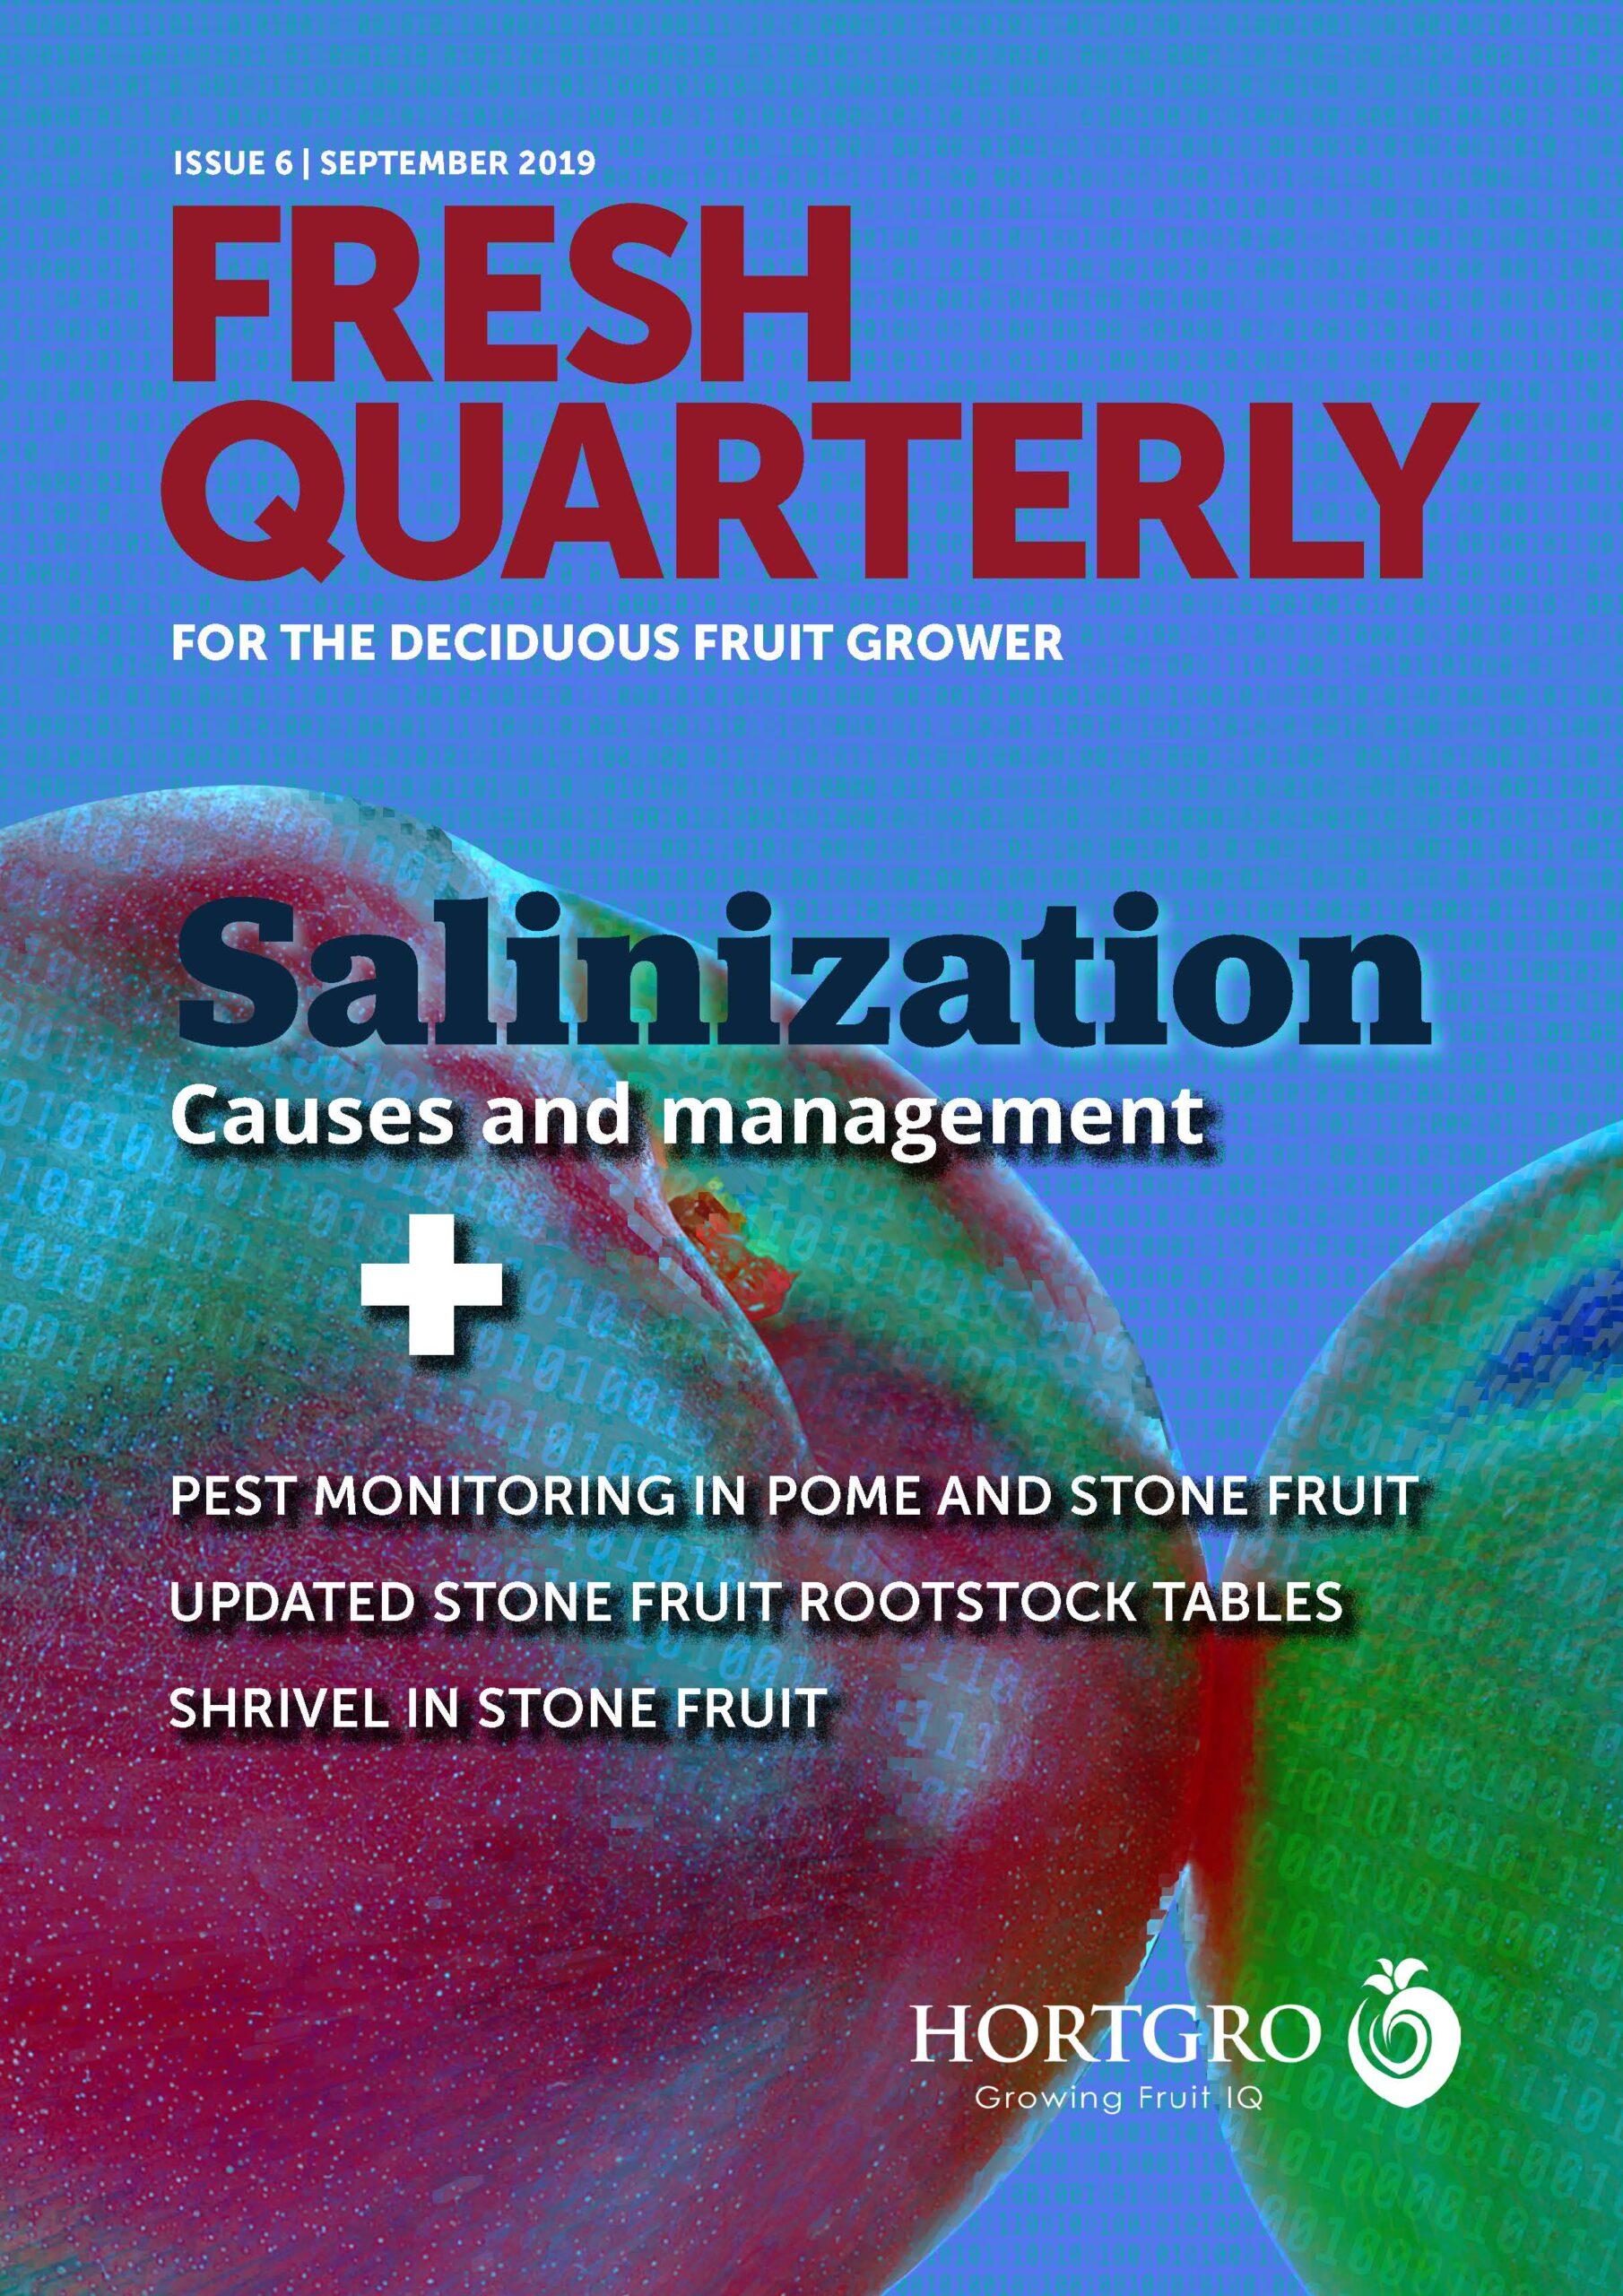 Cover for Fresh Quarterly September 2019 designed by Anna Mouton.